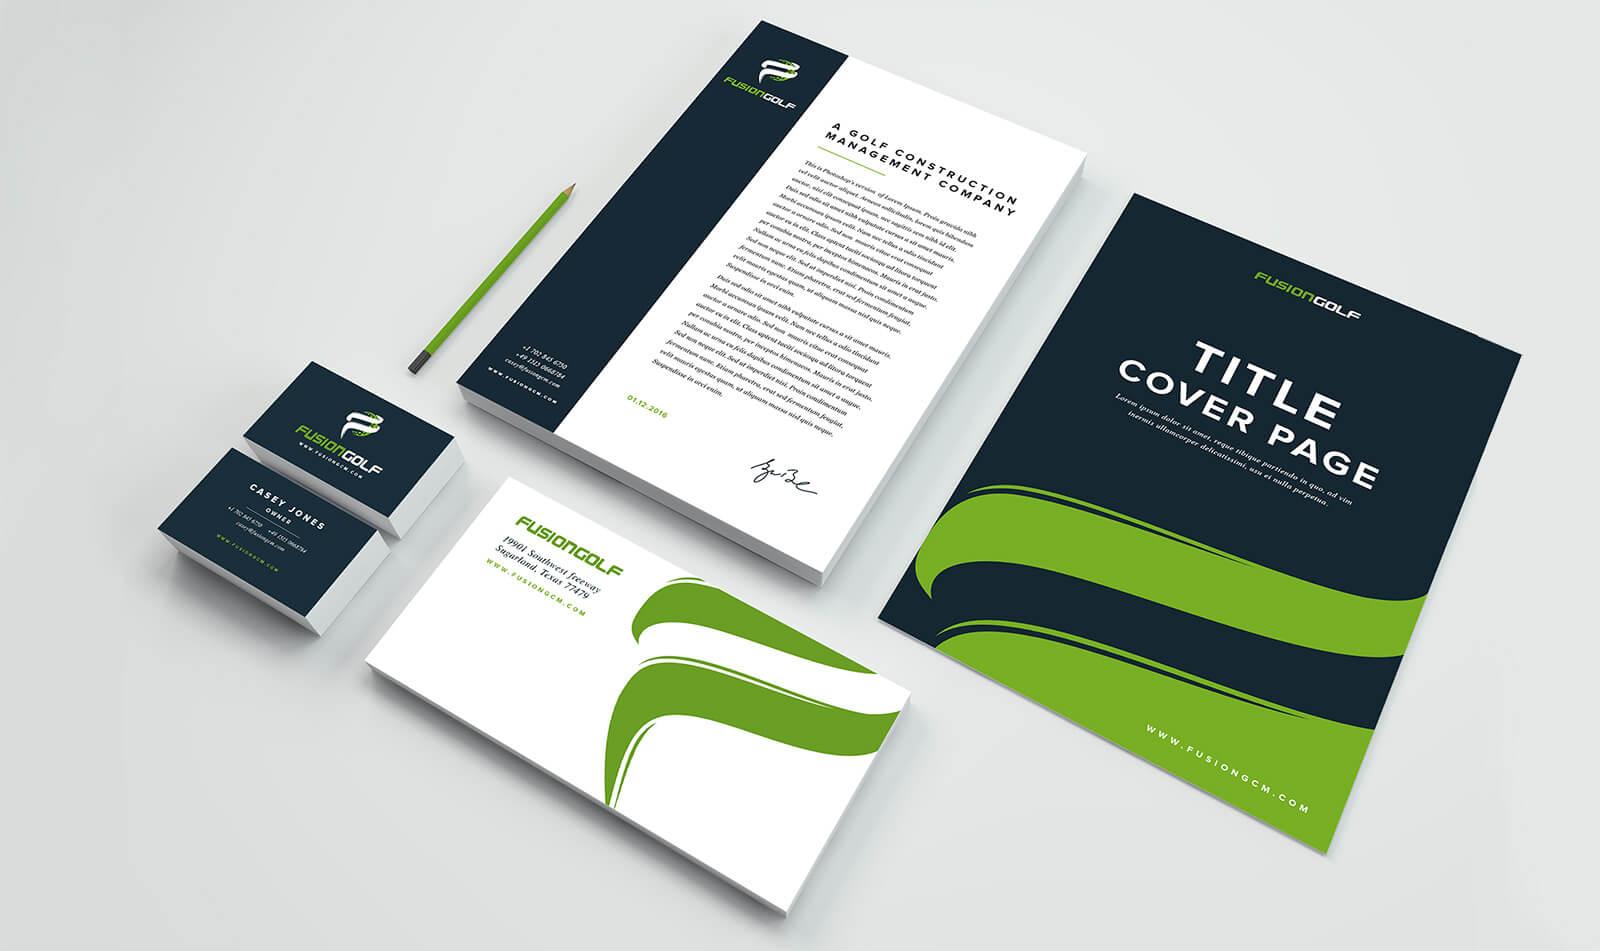 3_golf-club-branding